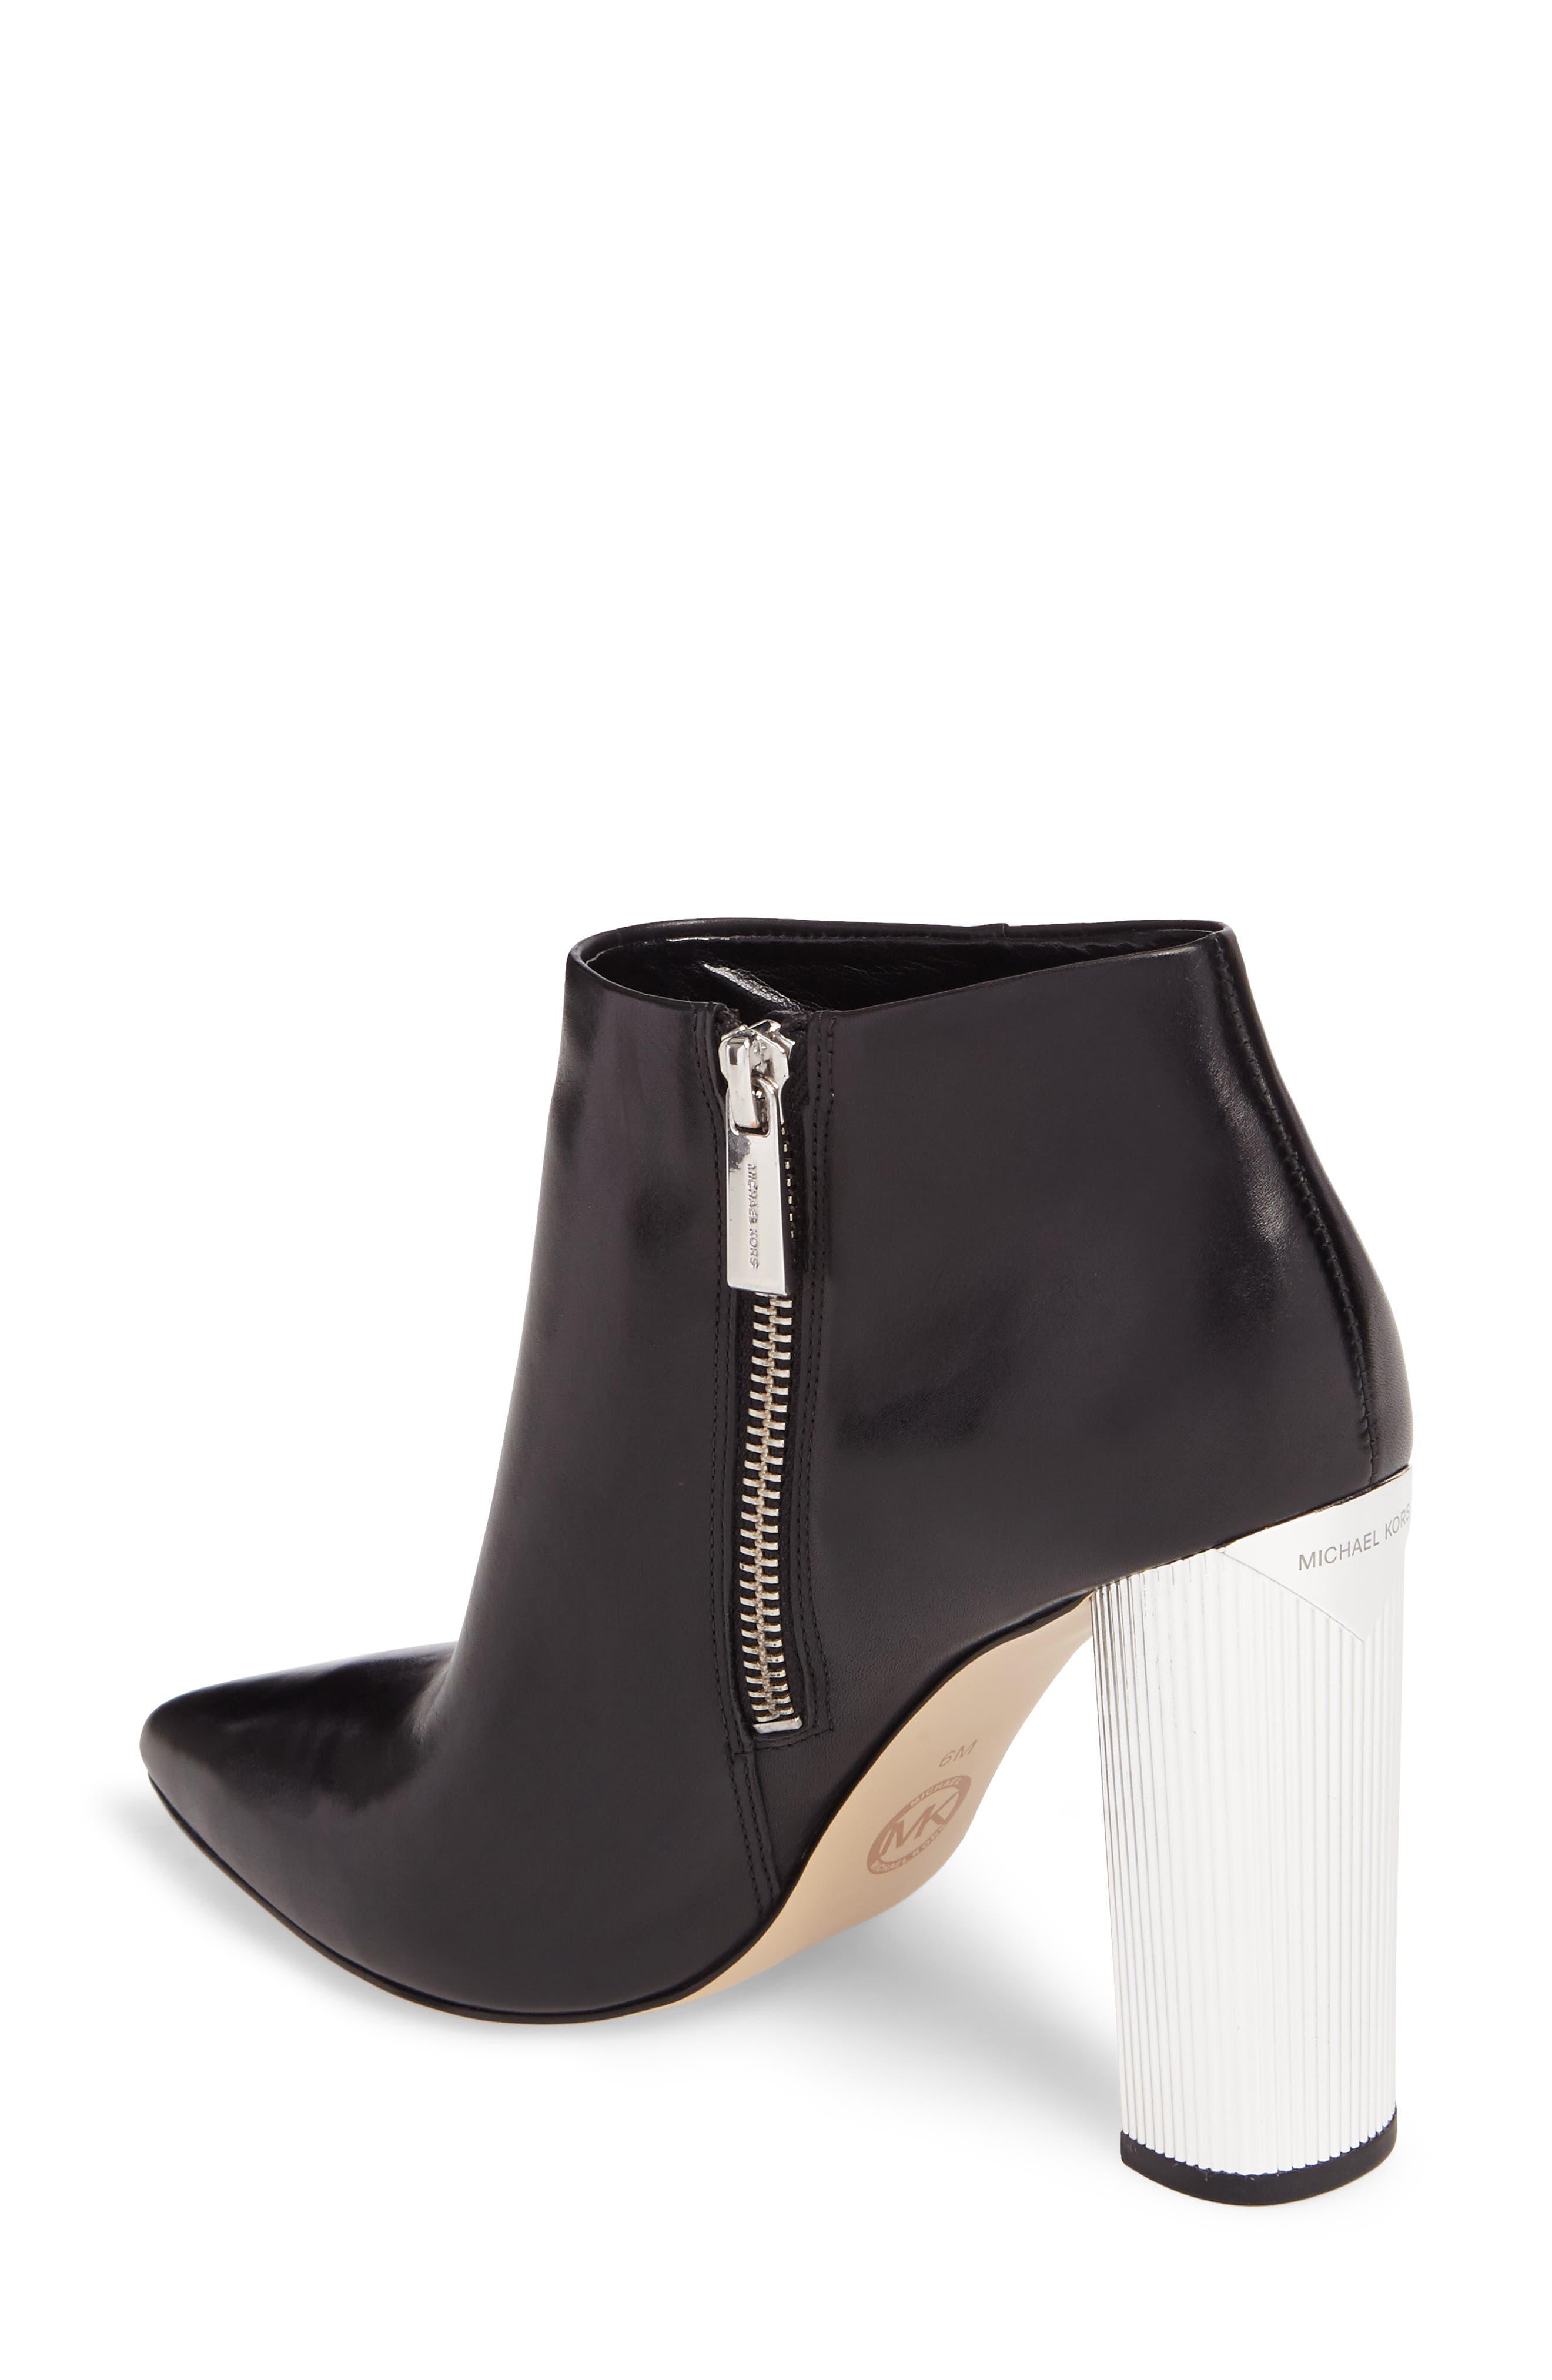 Paloma Bootie,                             Alternate thumbnail 2, color,                             Black Calf Leather